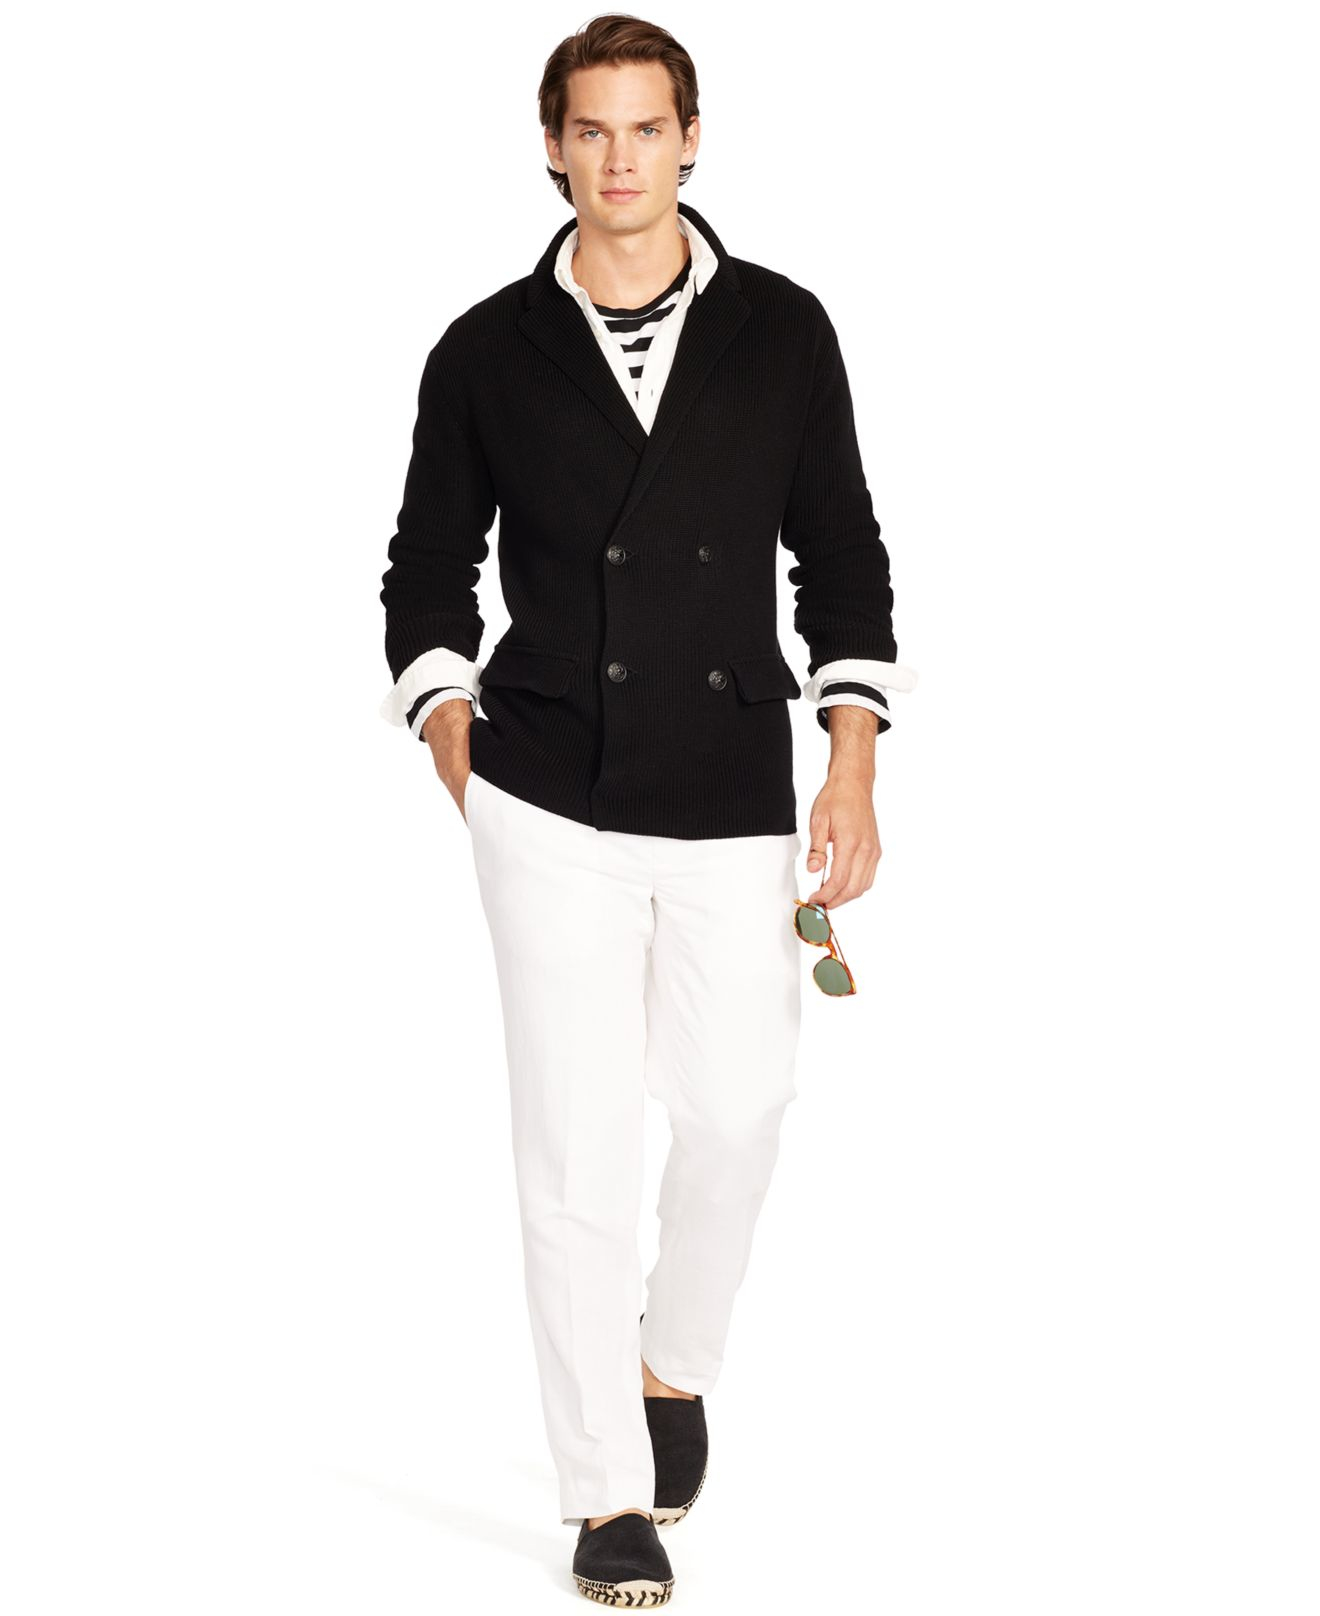 Polo ralph lauren Cotton Sweater Blazer in Black for Men | Lyst